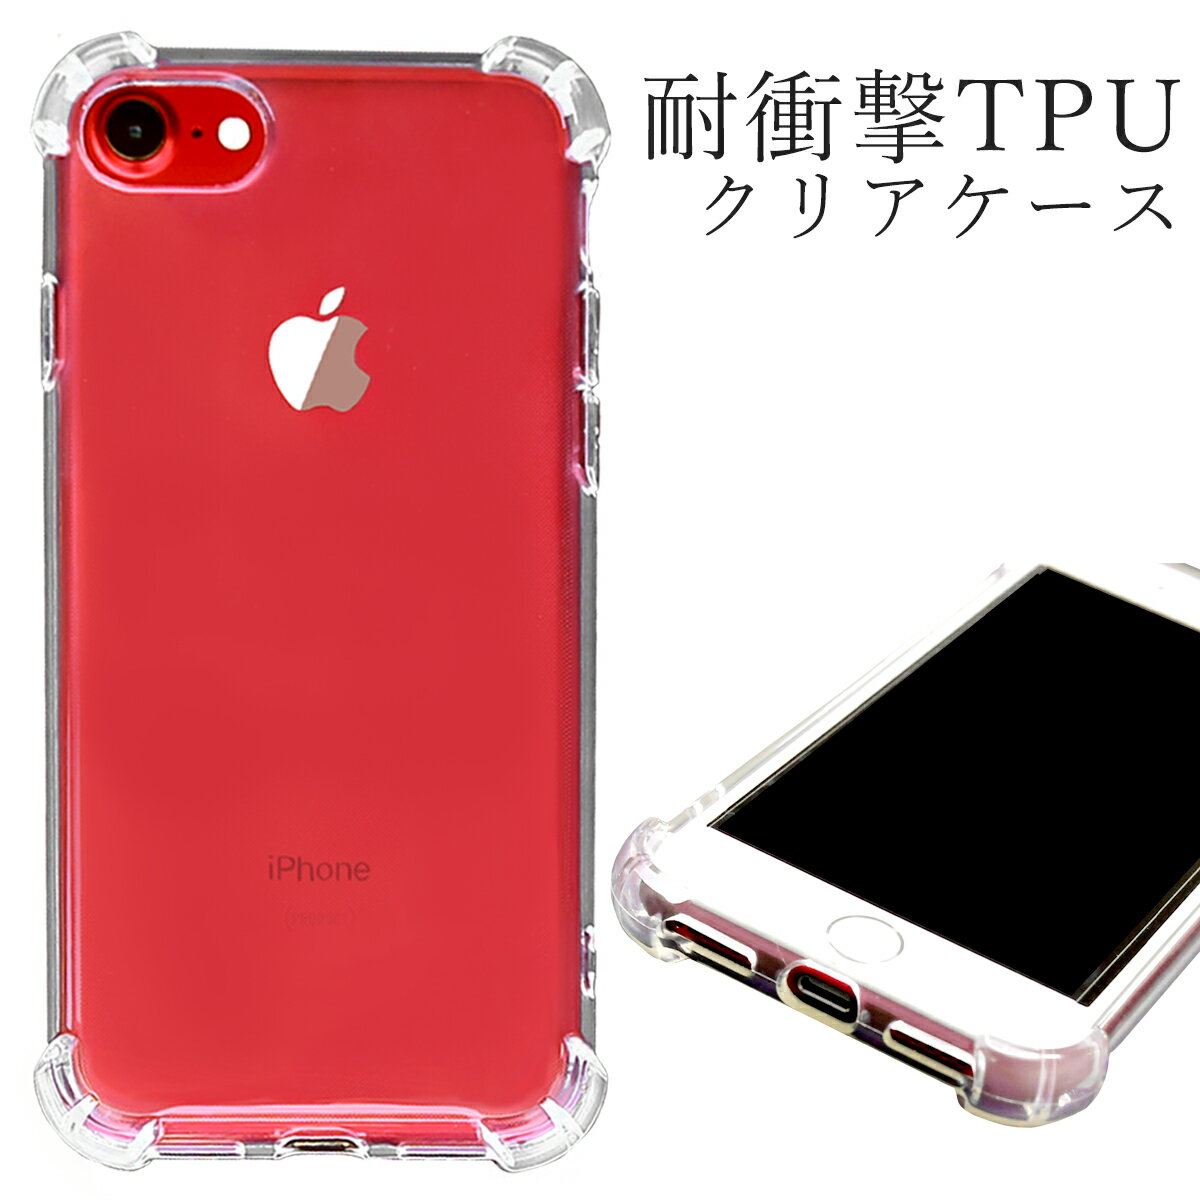 iphone7ケース TPUケース iphone8【耐衝撃】【クリアケース】【送料無料】クリアケース iPhone se iPhone6 Plus